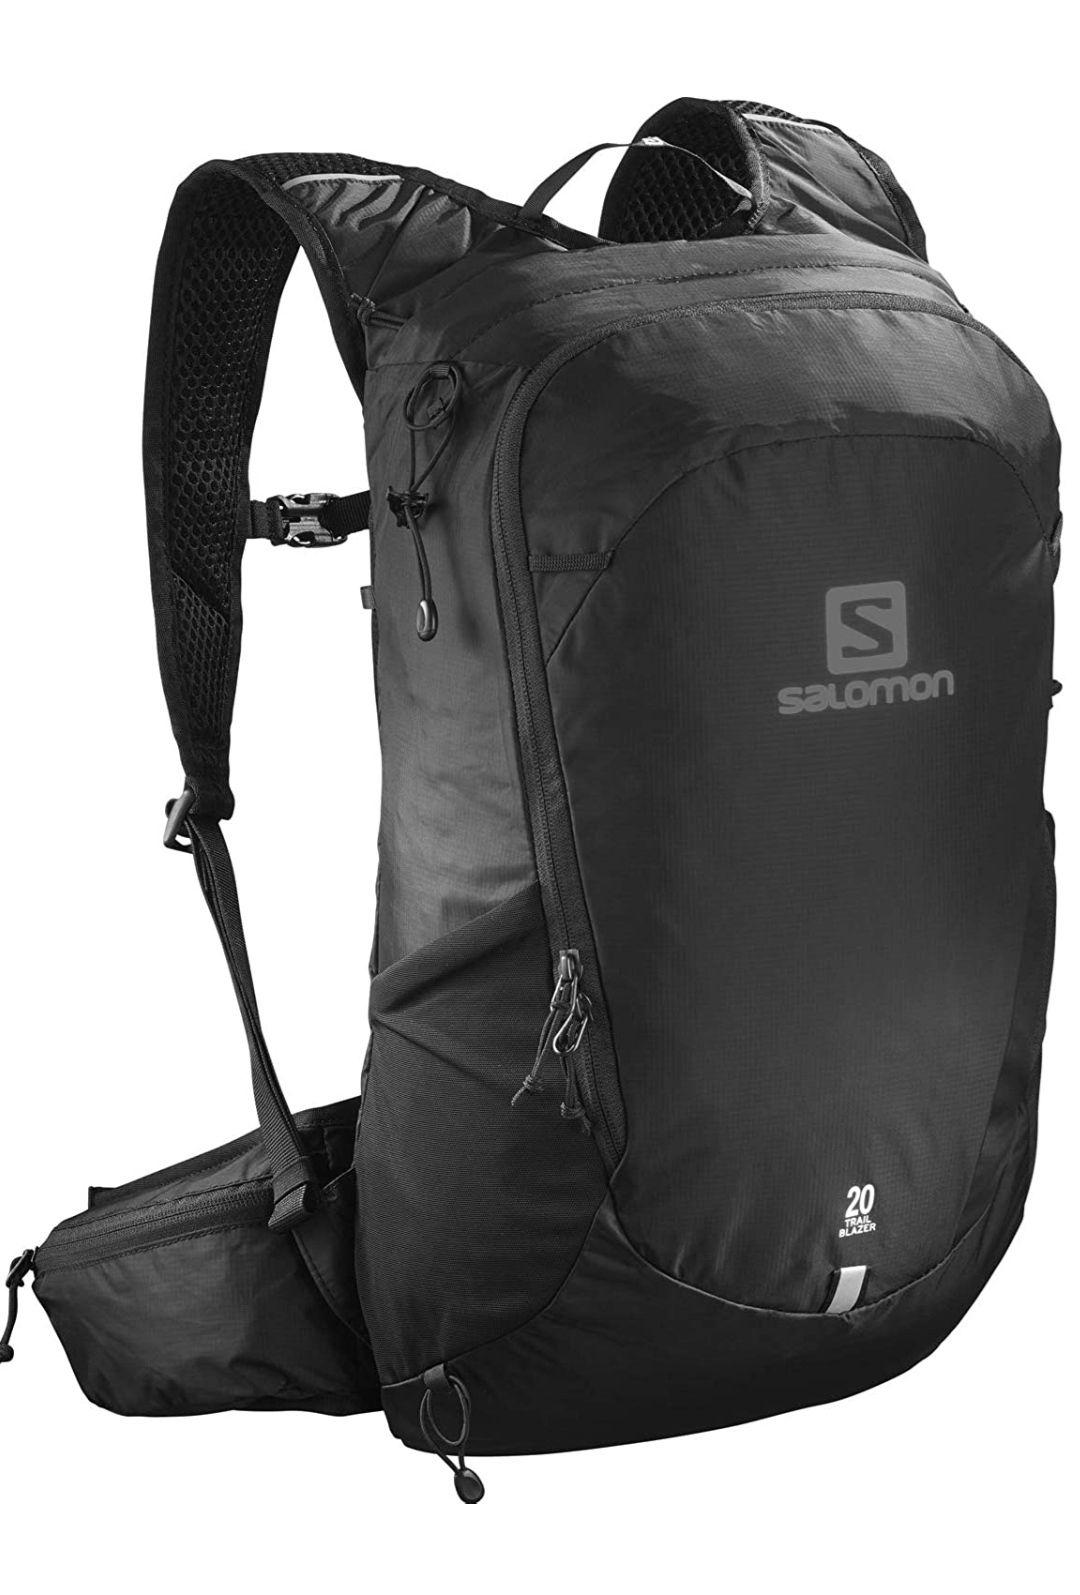 [Prime] Sac à dos Salomon Trailblazer 20L Rando Running Trail